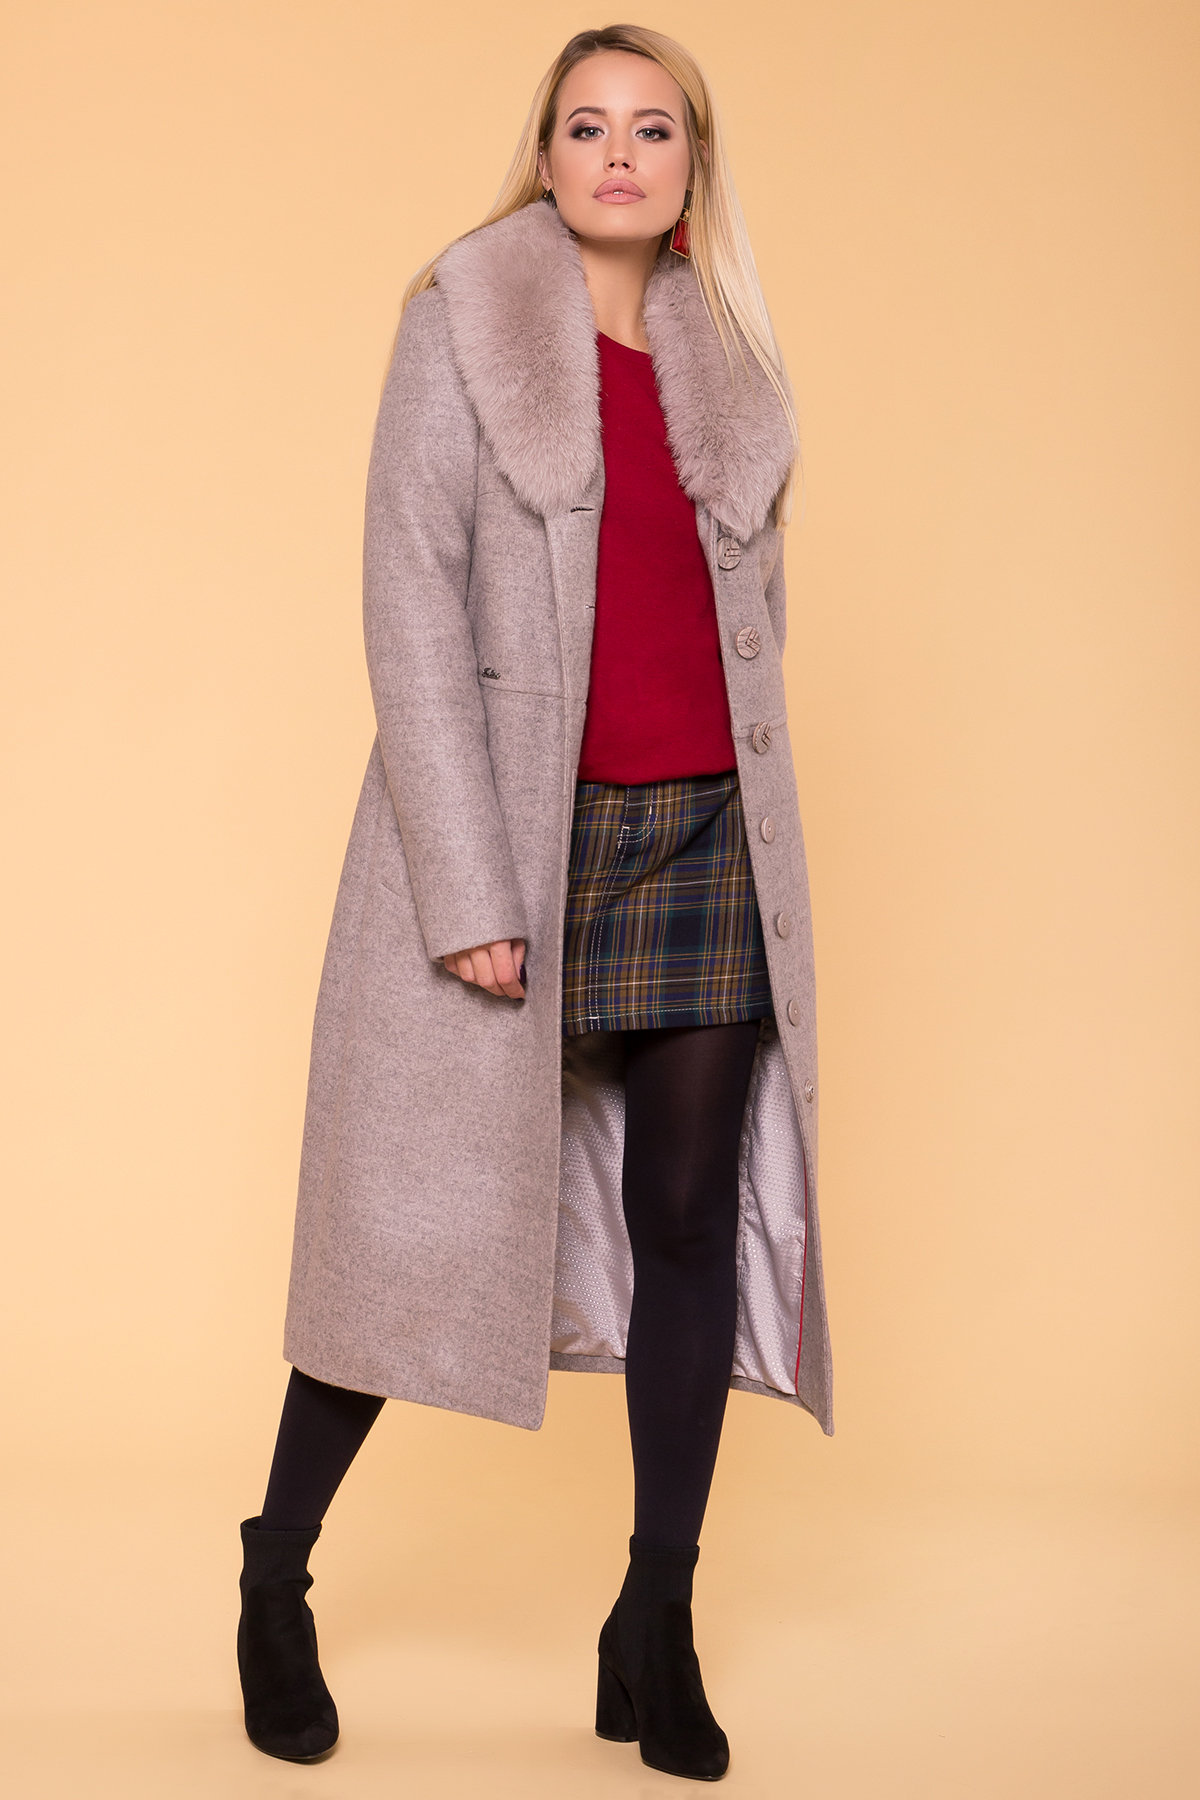 Пальто зима Габриэлла макси 5890 АРТ. 39456 Цвет: Бежевый 31 - фото 3, интернет магазин tm-modus.ru